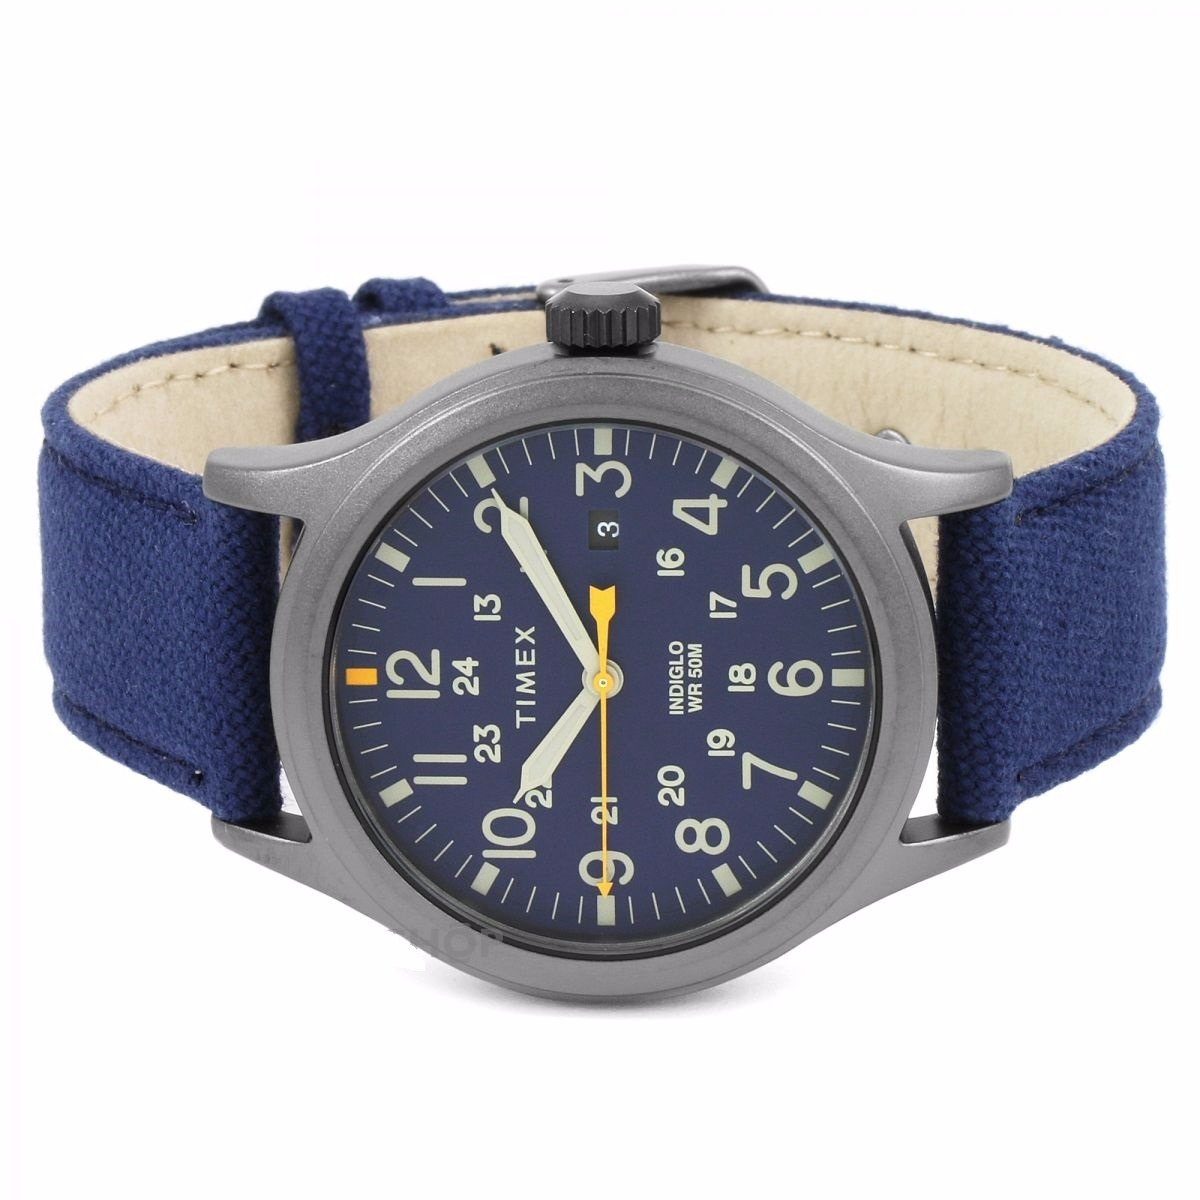 683f306e1ea8 reloj timex allied tw2r46200 caballero gris azul piel nylon . Cargando zoom.